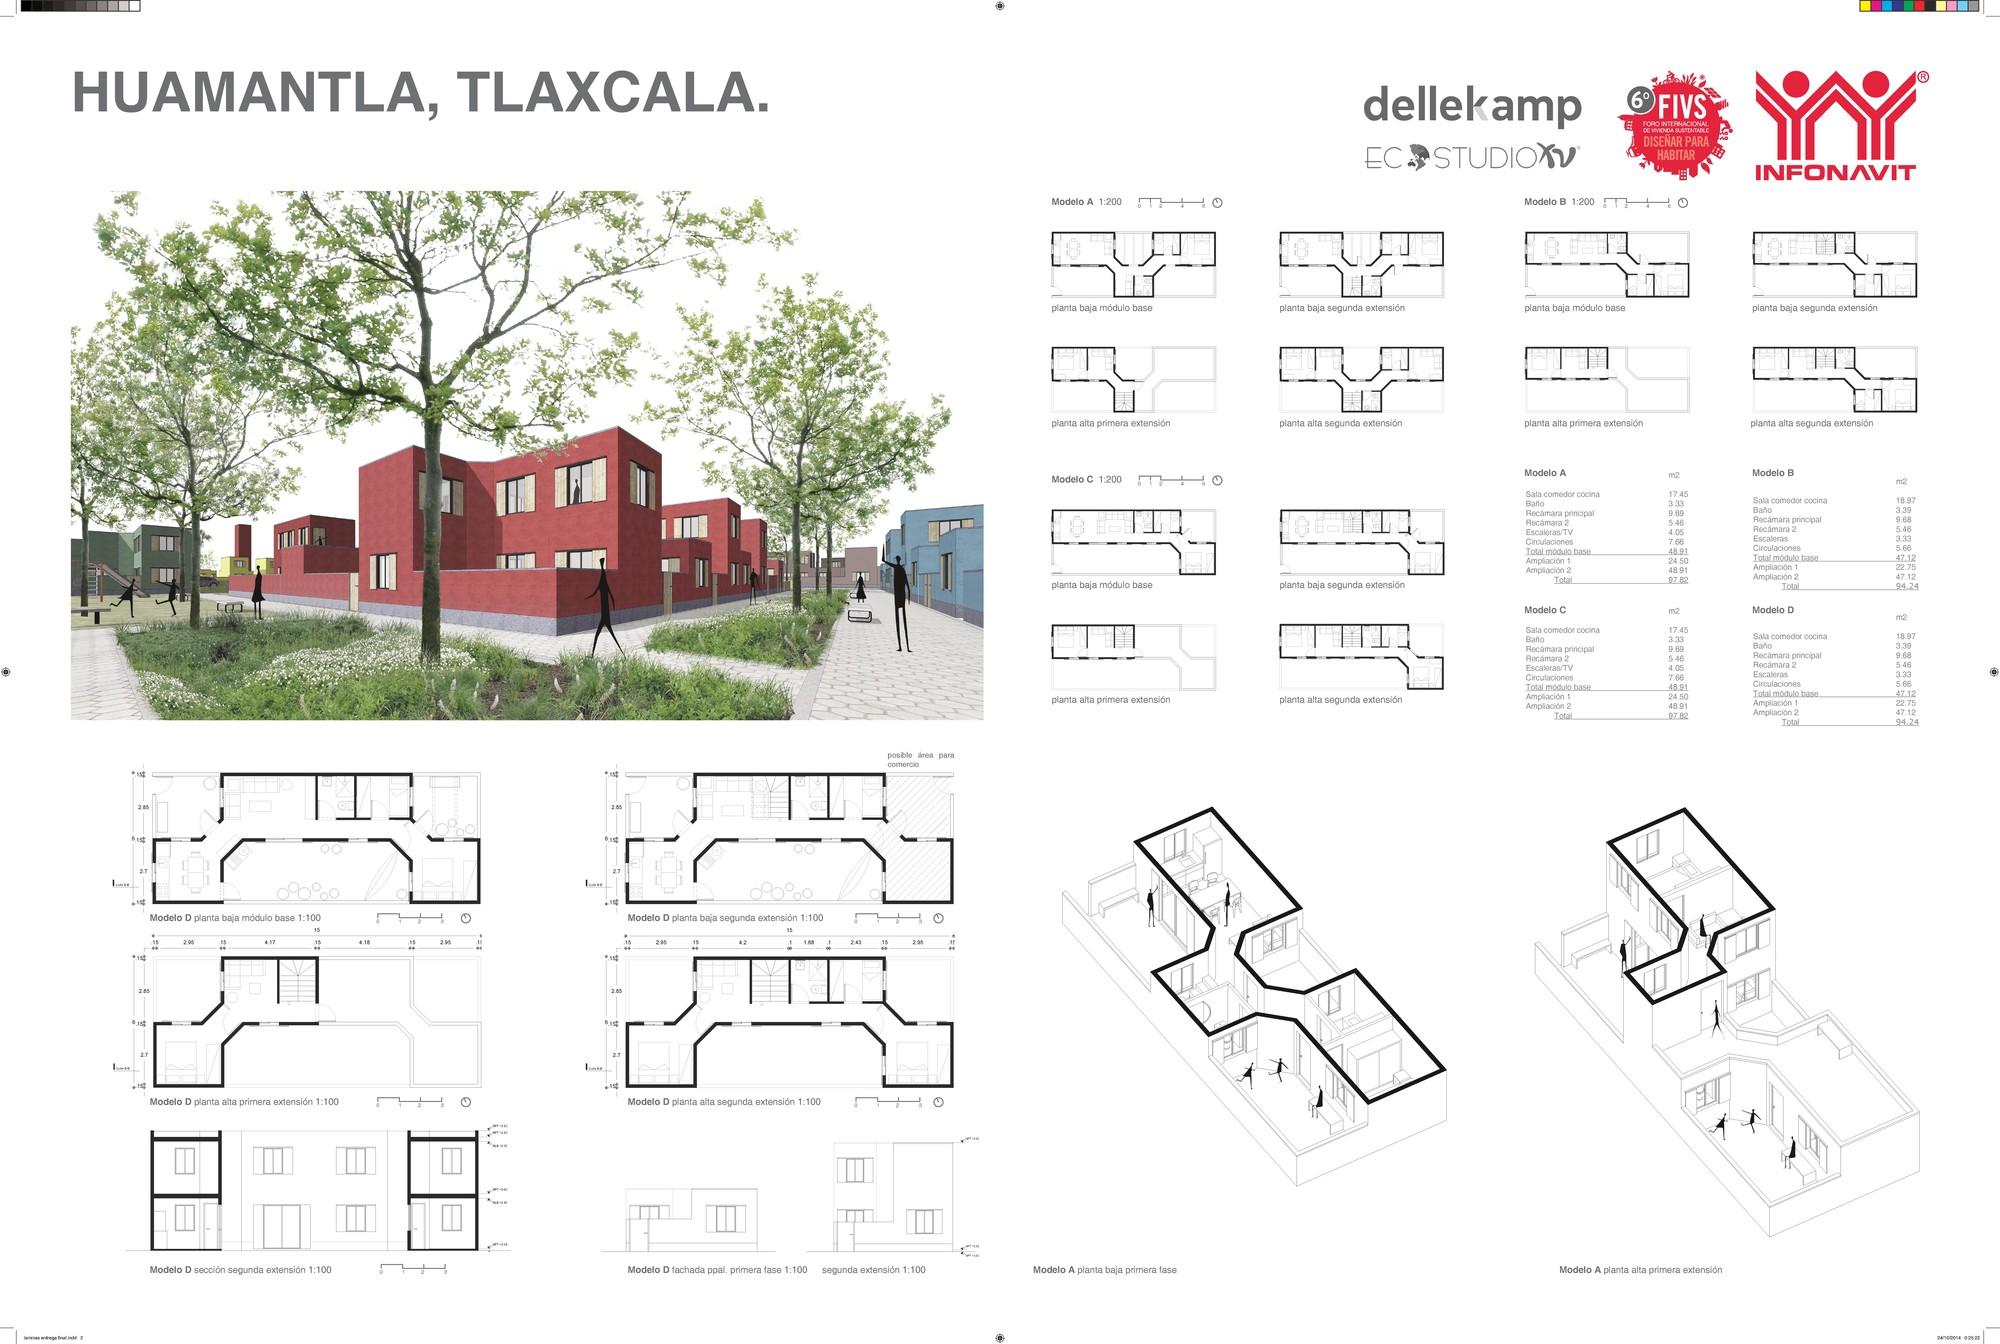 © Dellekamp Arquitectos